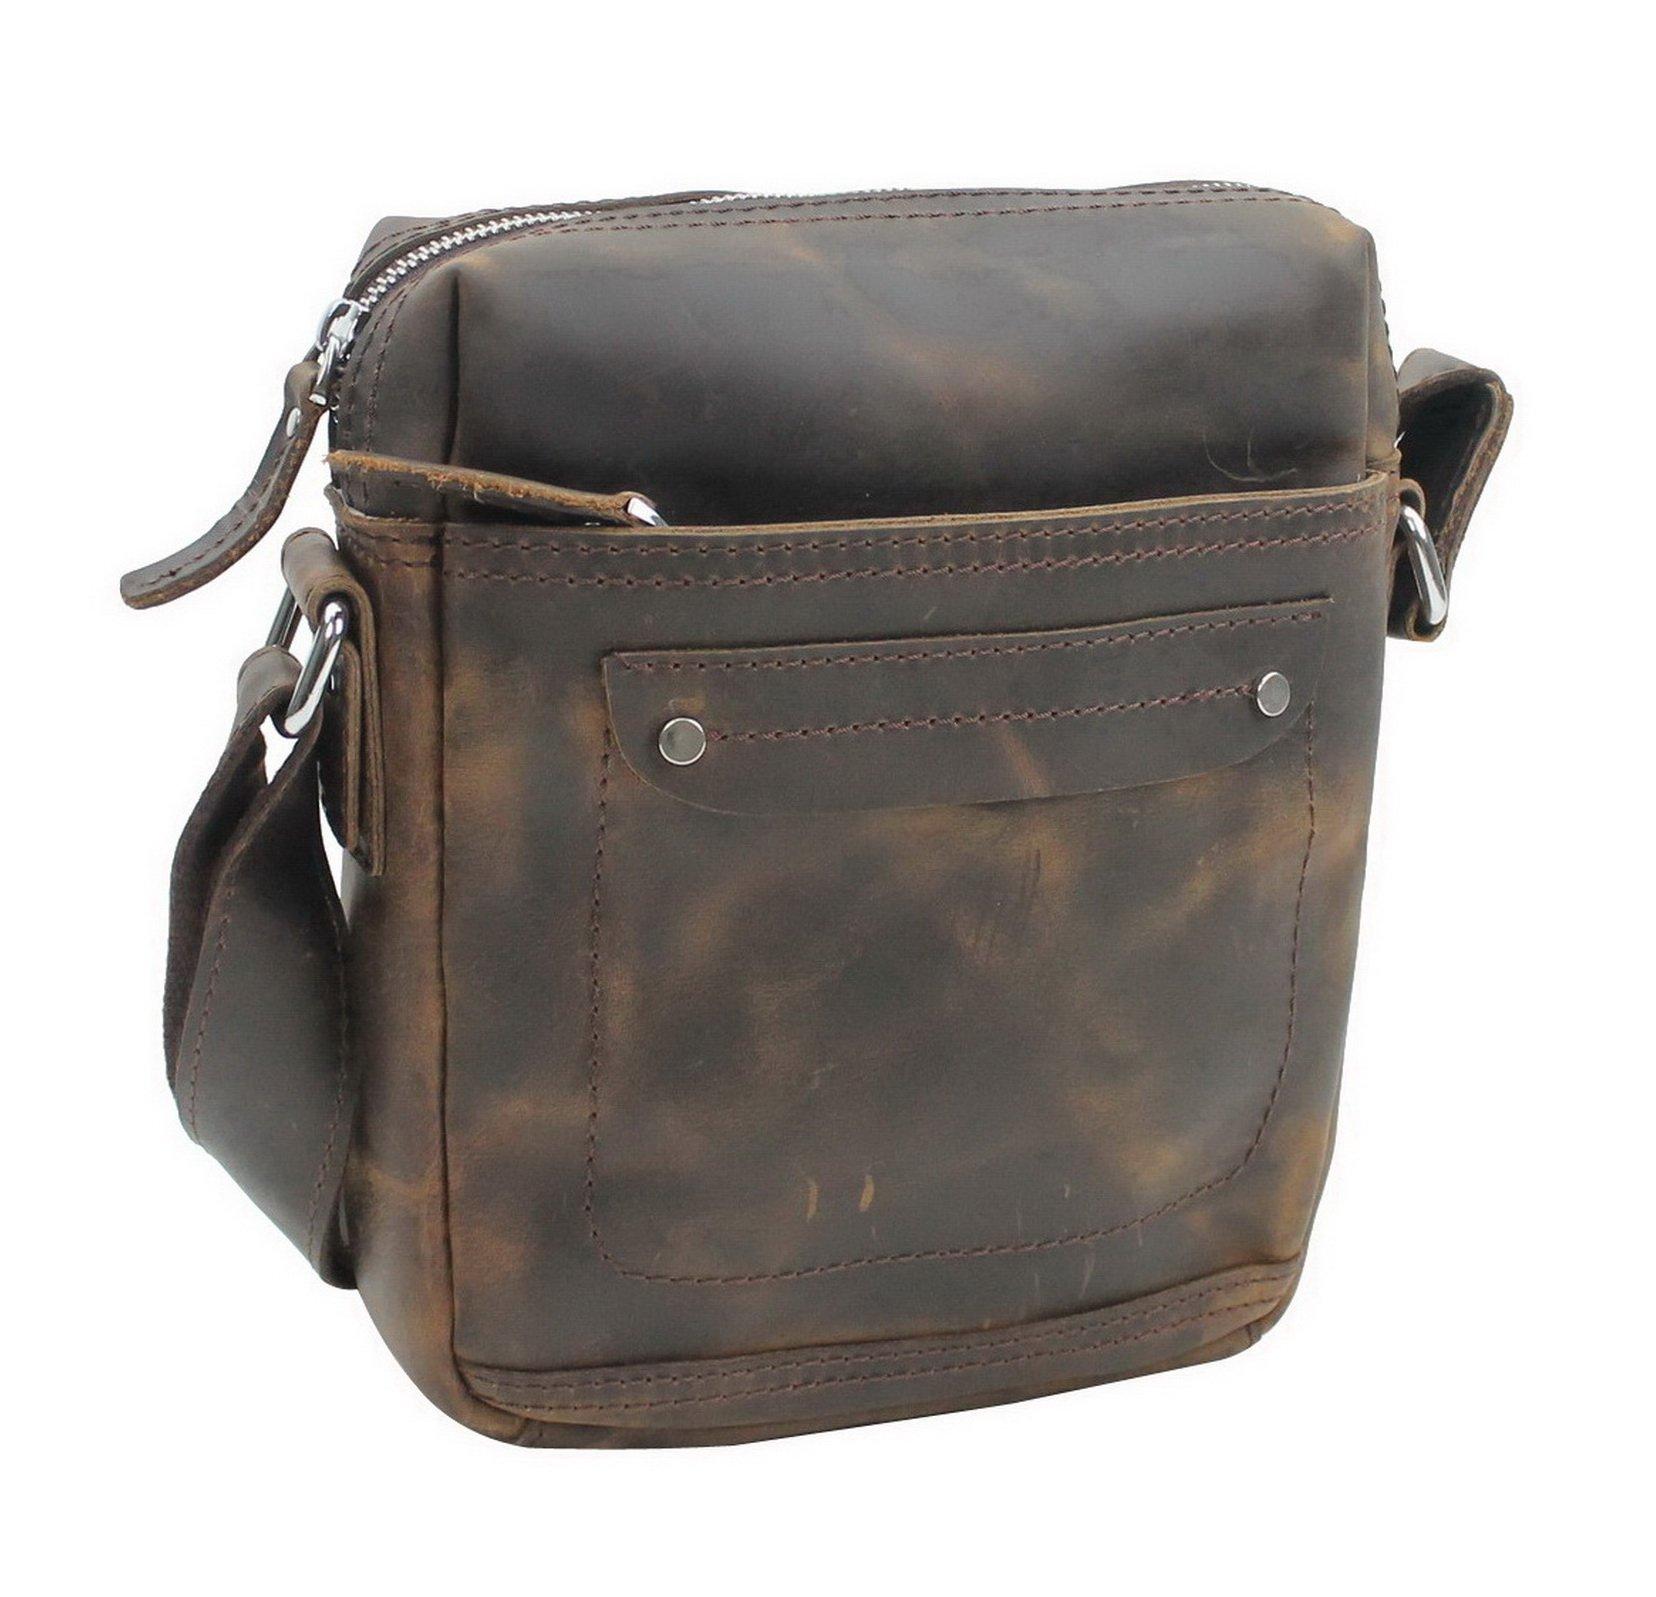 Vagabond Traveler Full Grain Leather Shoulder Bag L76. Dark Brown by Vagabond Traveler